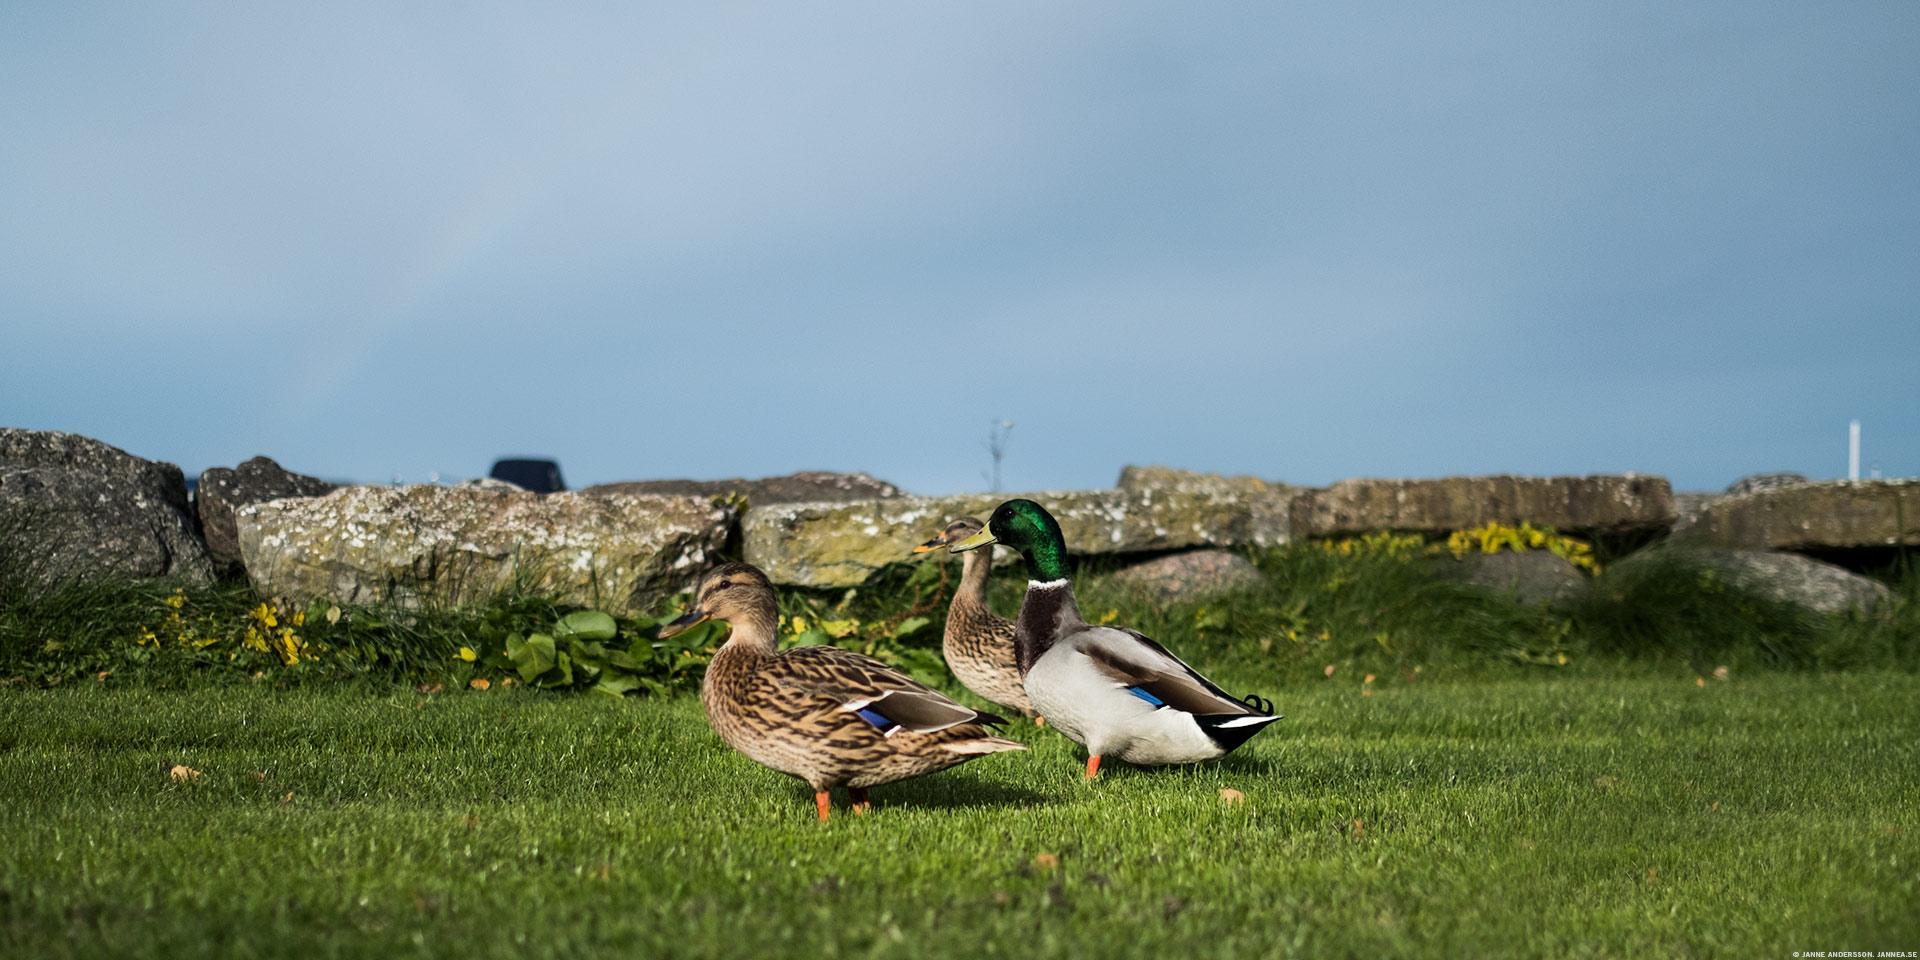 Quack – Gräsänder på gräs   © Janne A